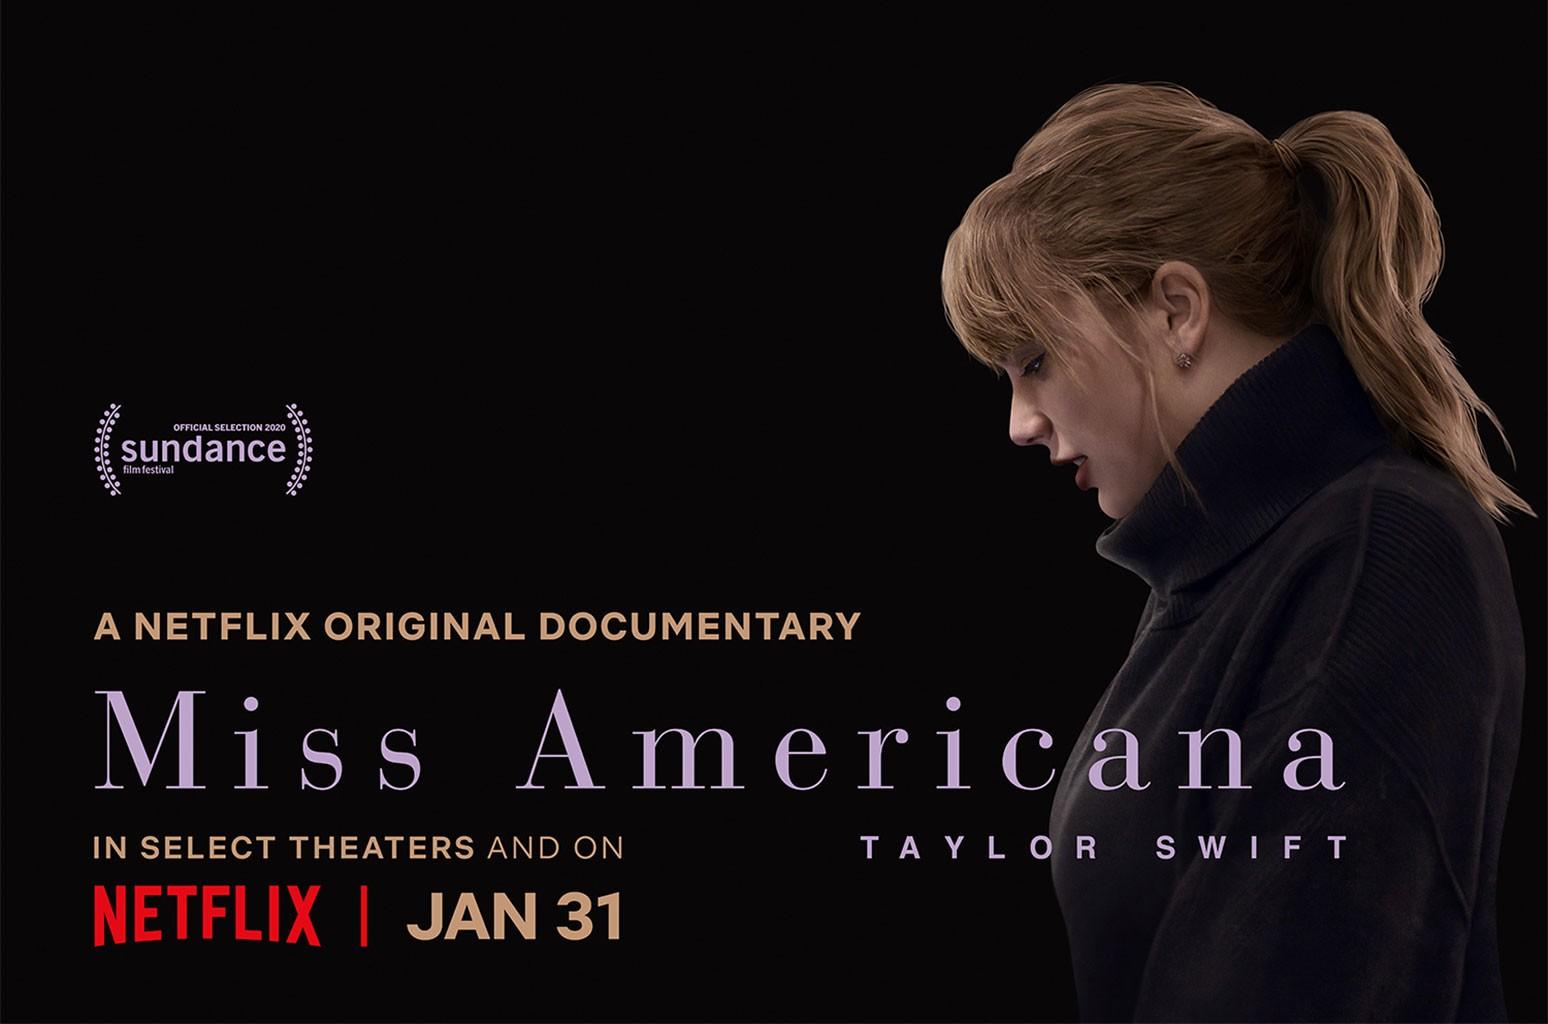 Taylor Swift Miss Americana Netflix Doc Has A Release Date We Re So Ready For It Billboard